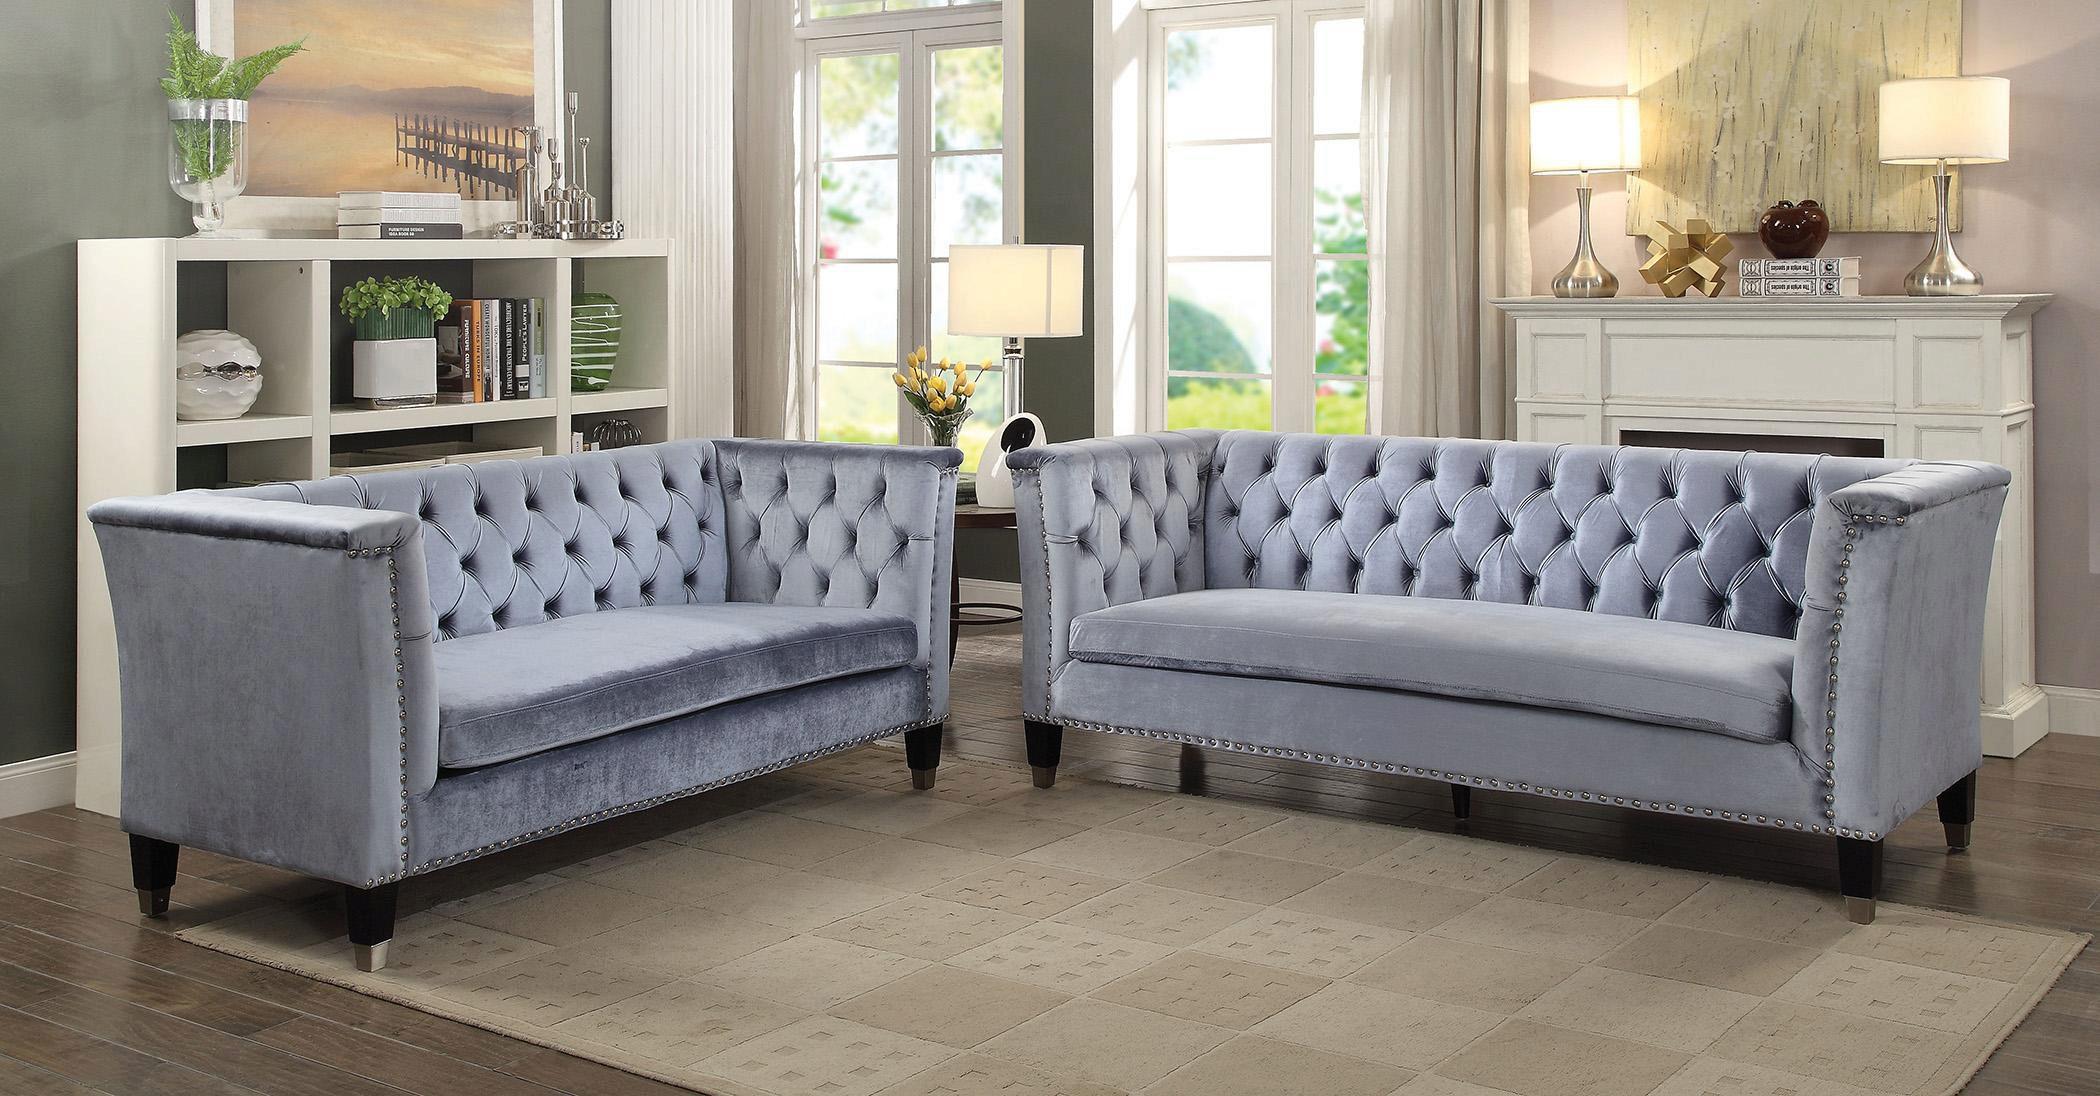 Picture of: Blue Grey Velvet Tufted Sofa Set 2 Pcs Vintage Traditional Acme 52785 Honor Honor 52785 Set 2